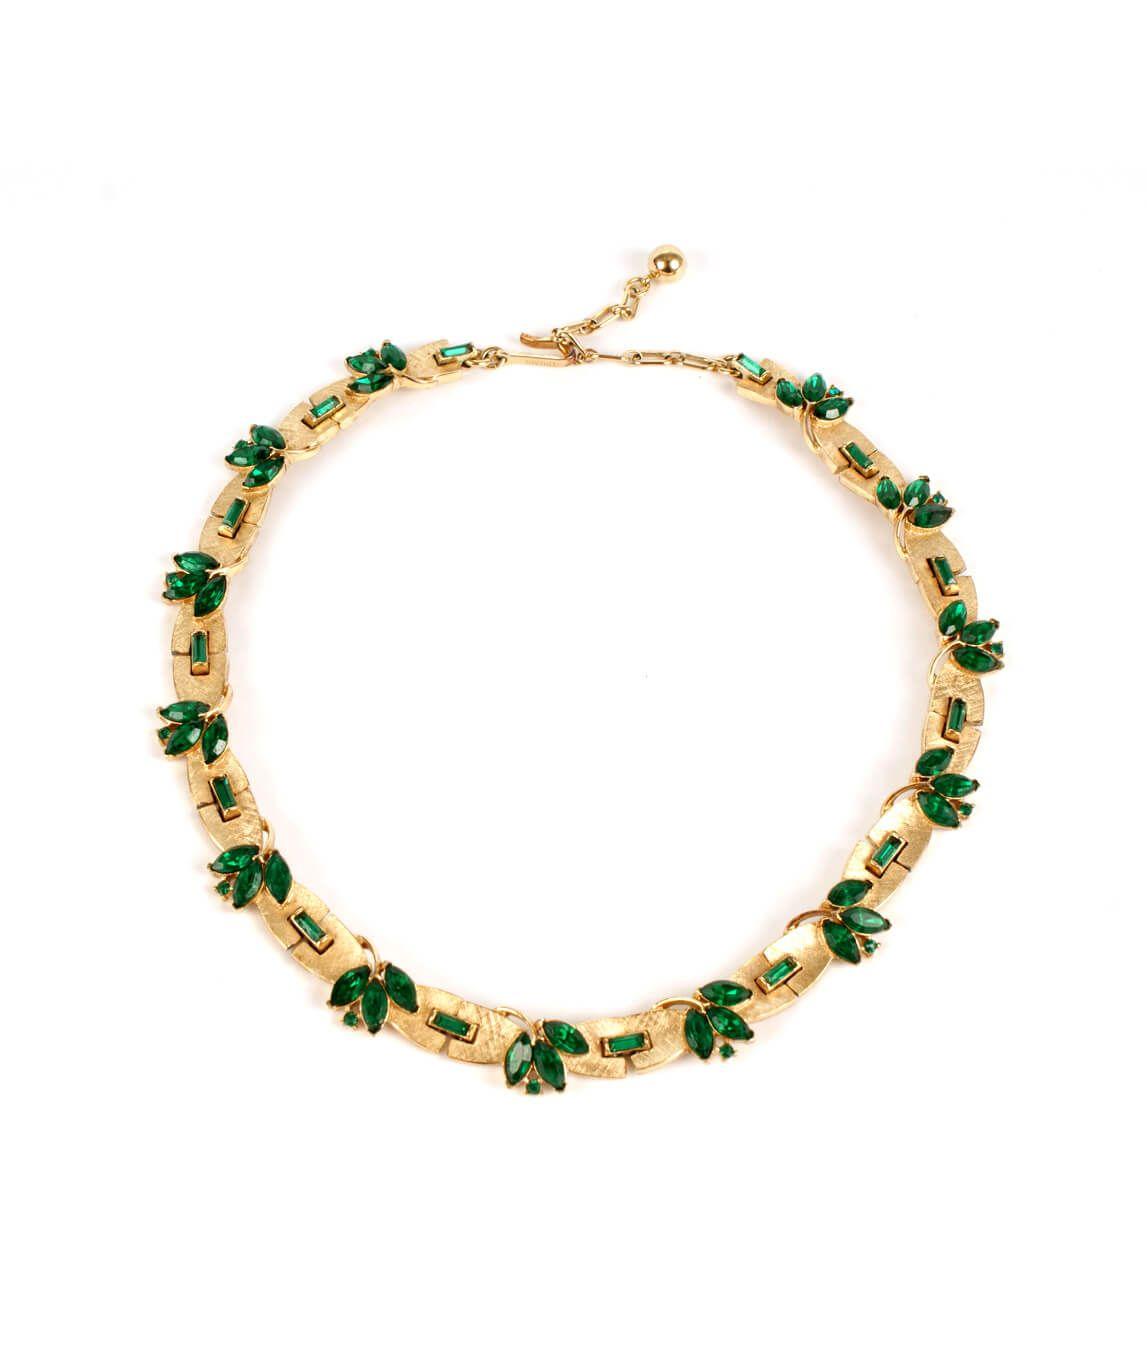 Trifari green and gold choker